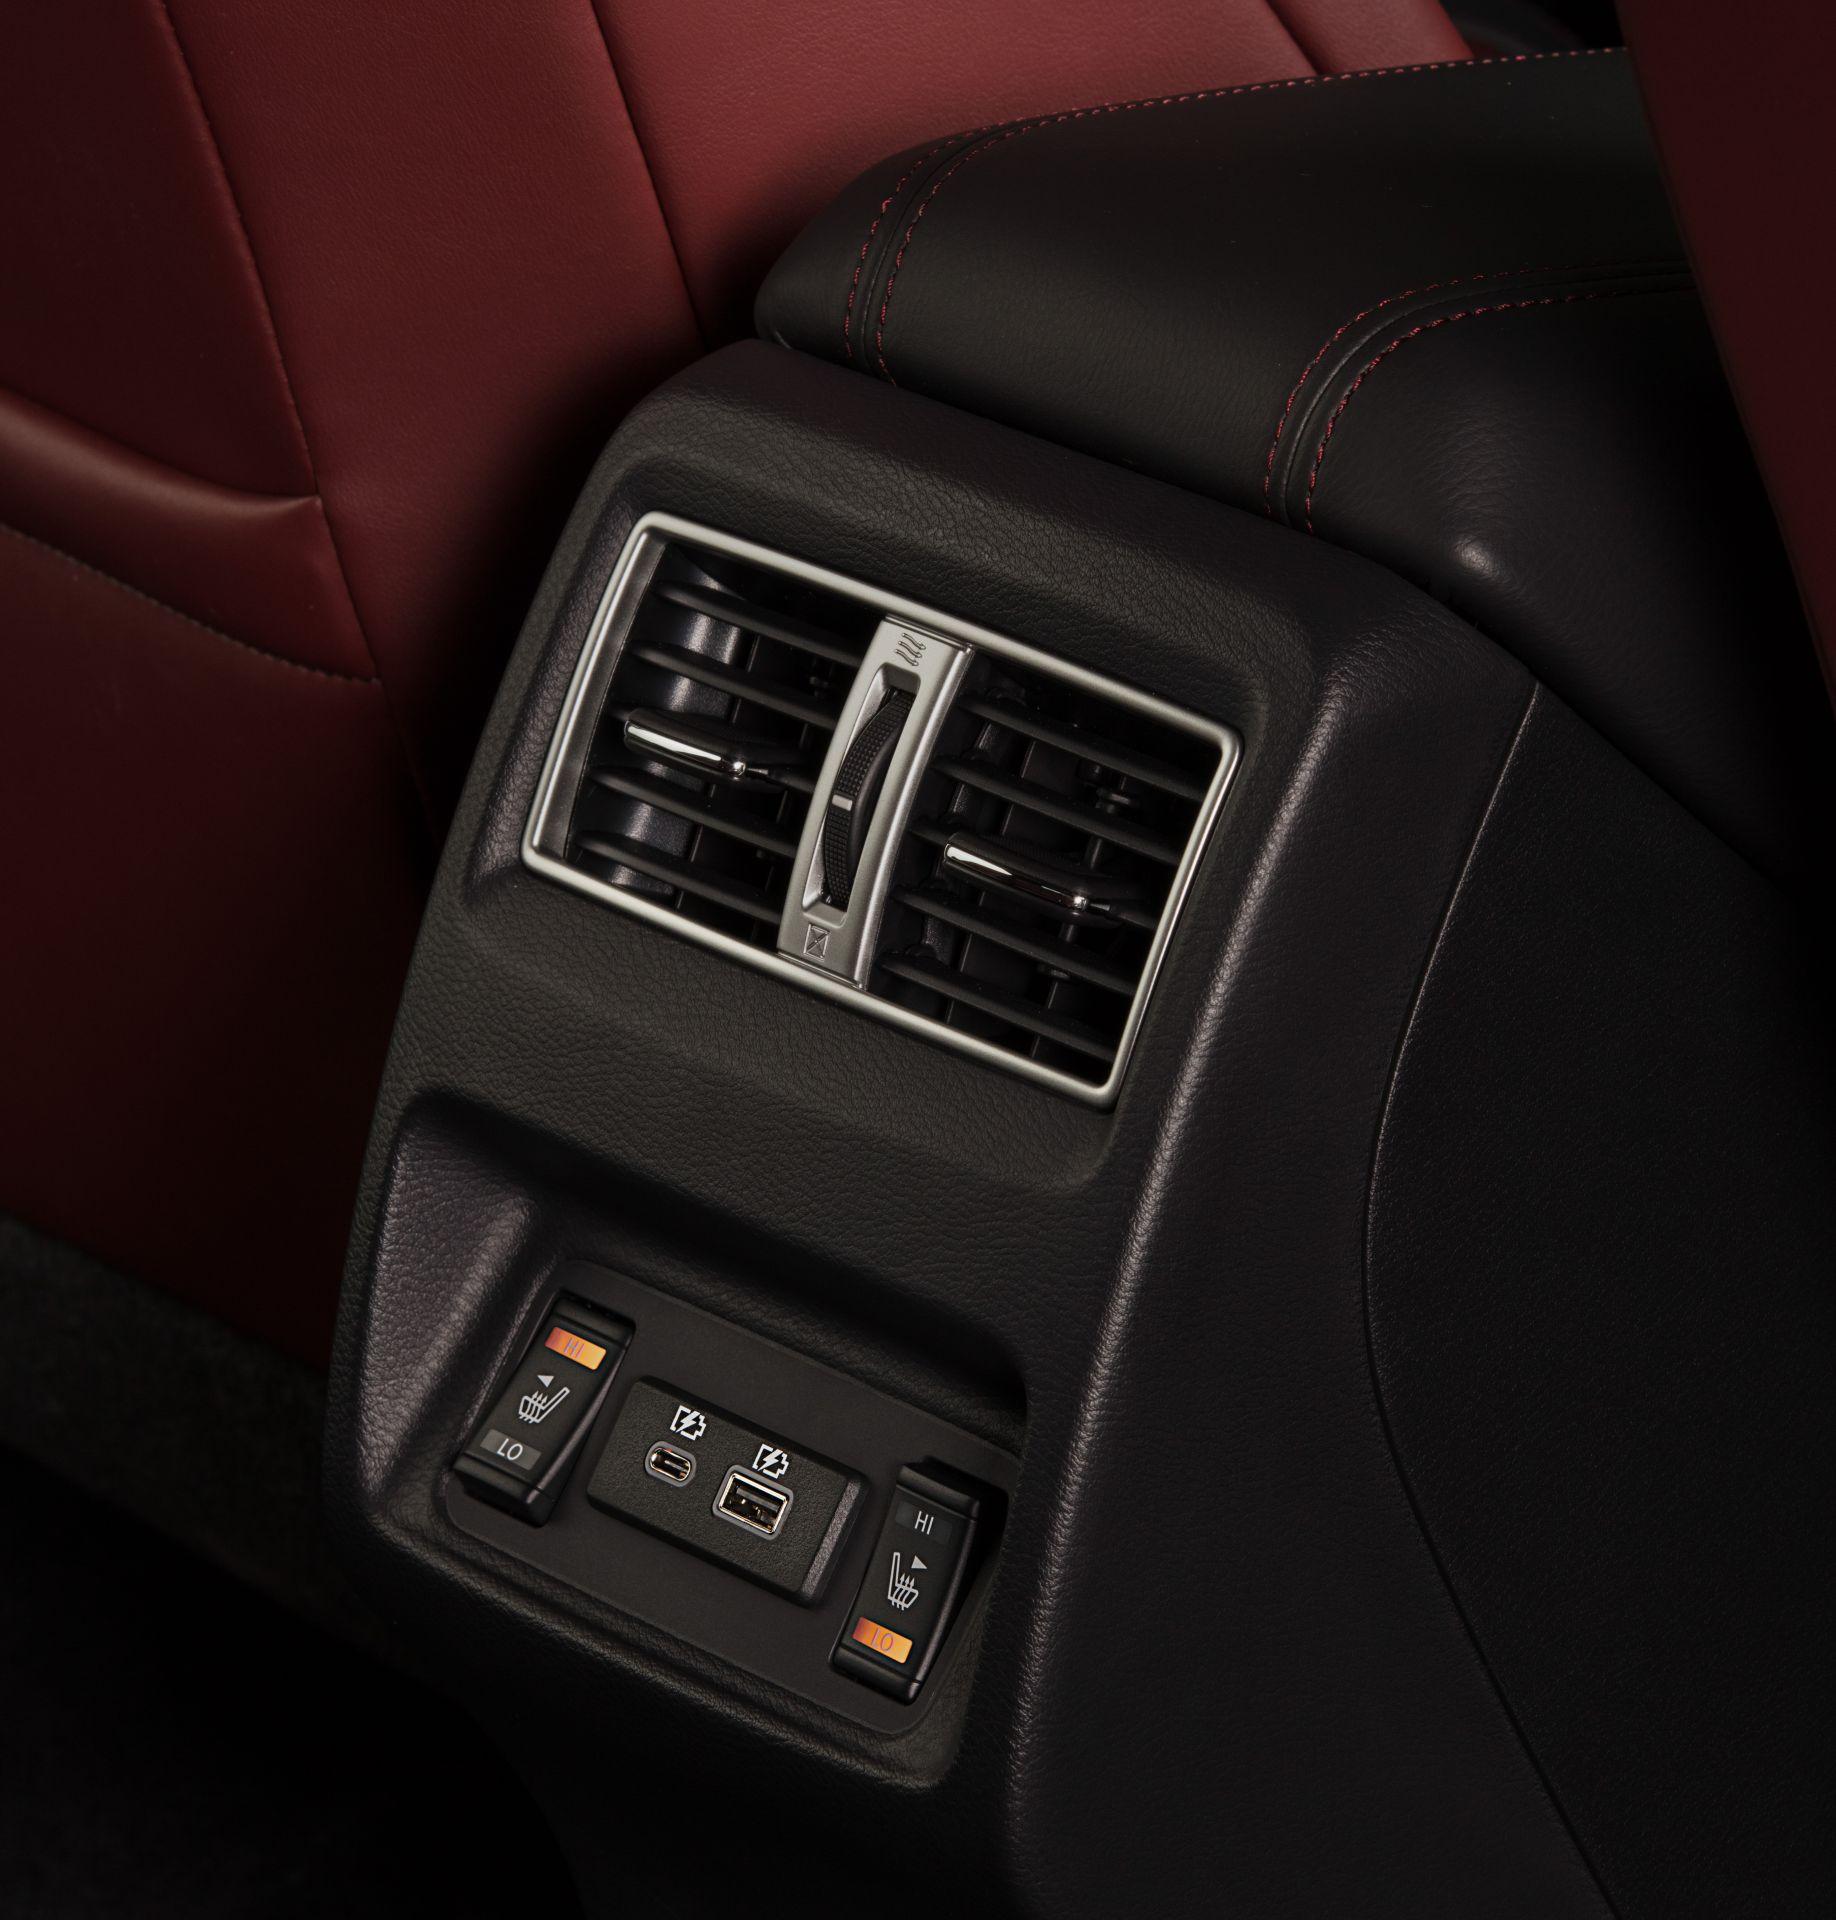 Nissan-Maxima-40th-Anniversary-Edition-19